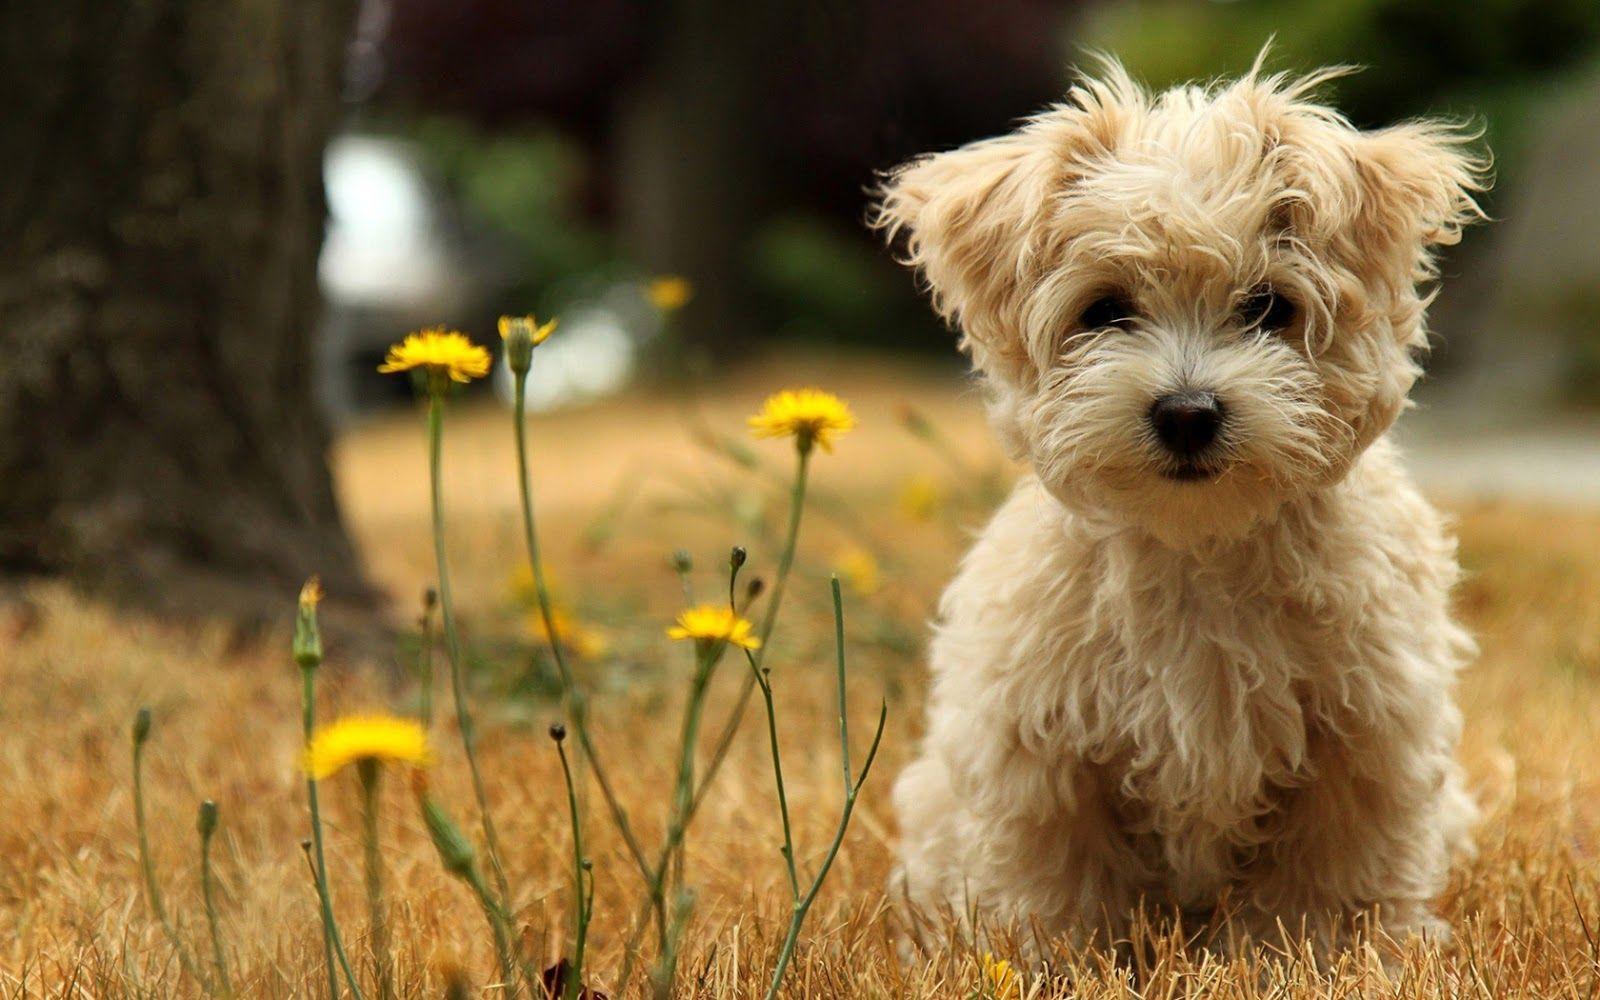 Hd Cute Dog Images Com Download 3d Hd Colour Design Teddy Bear